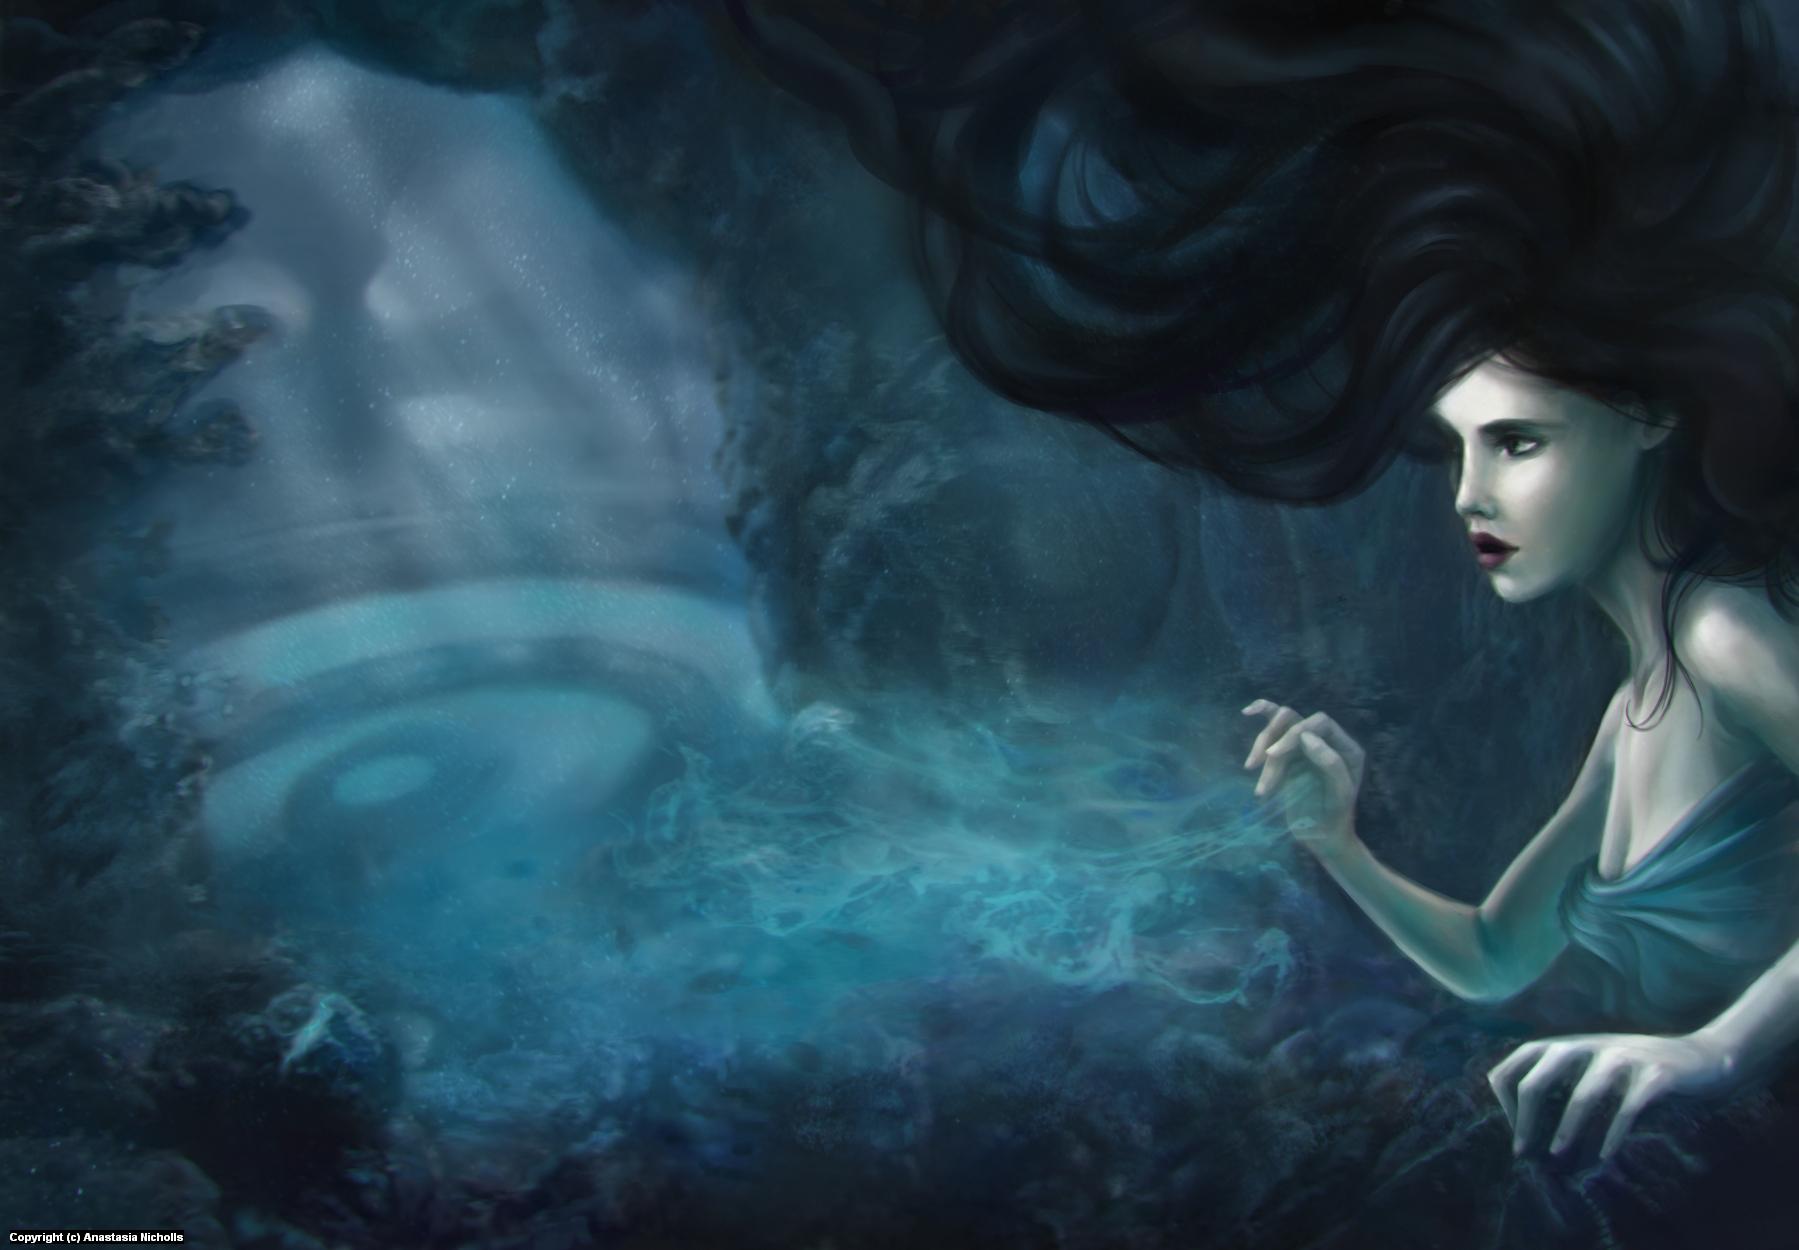 Deep blue. Artwork by Anastasia Nicholls